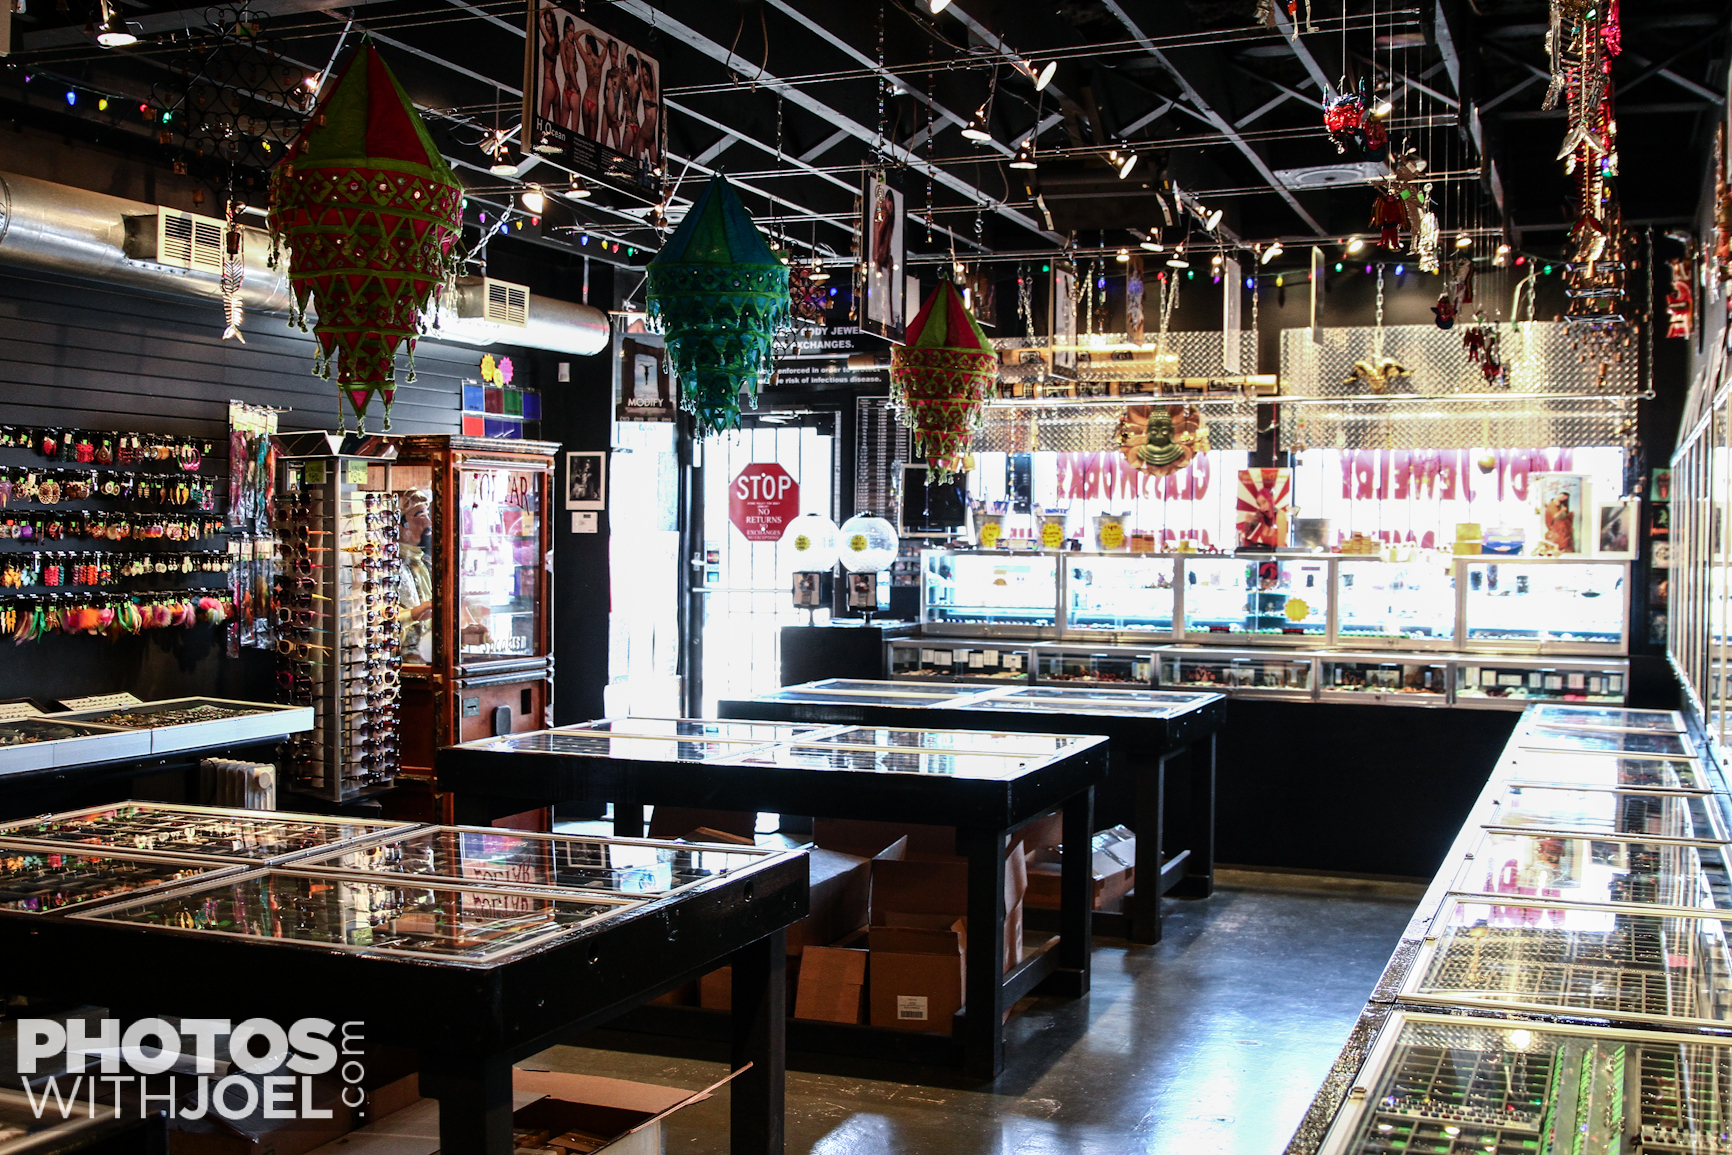 Tulsa body jewelry in tulsa ok 74112 for Tattoo and piercing shops in tulsa ok